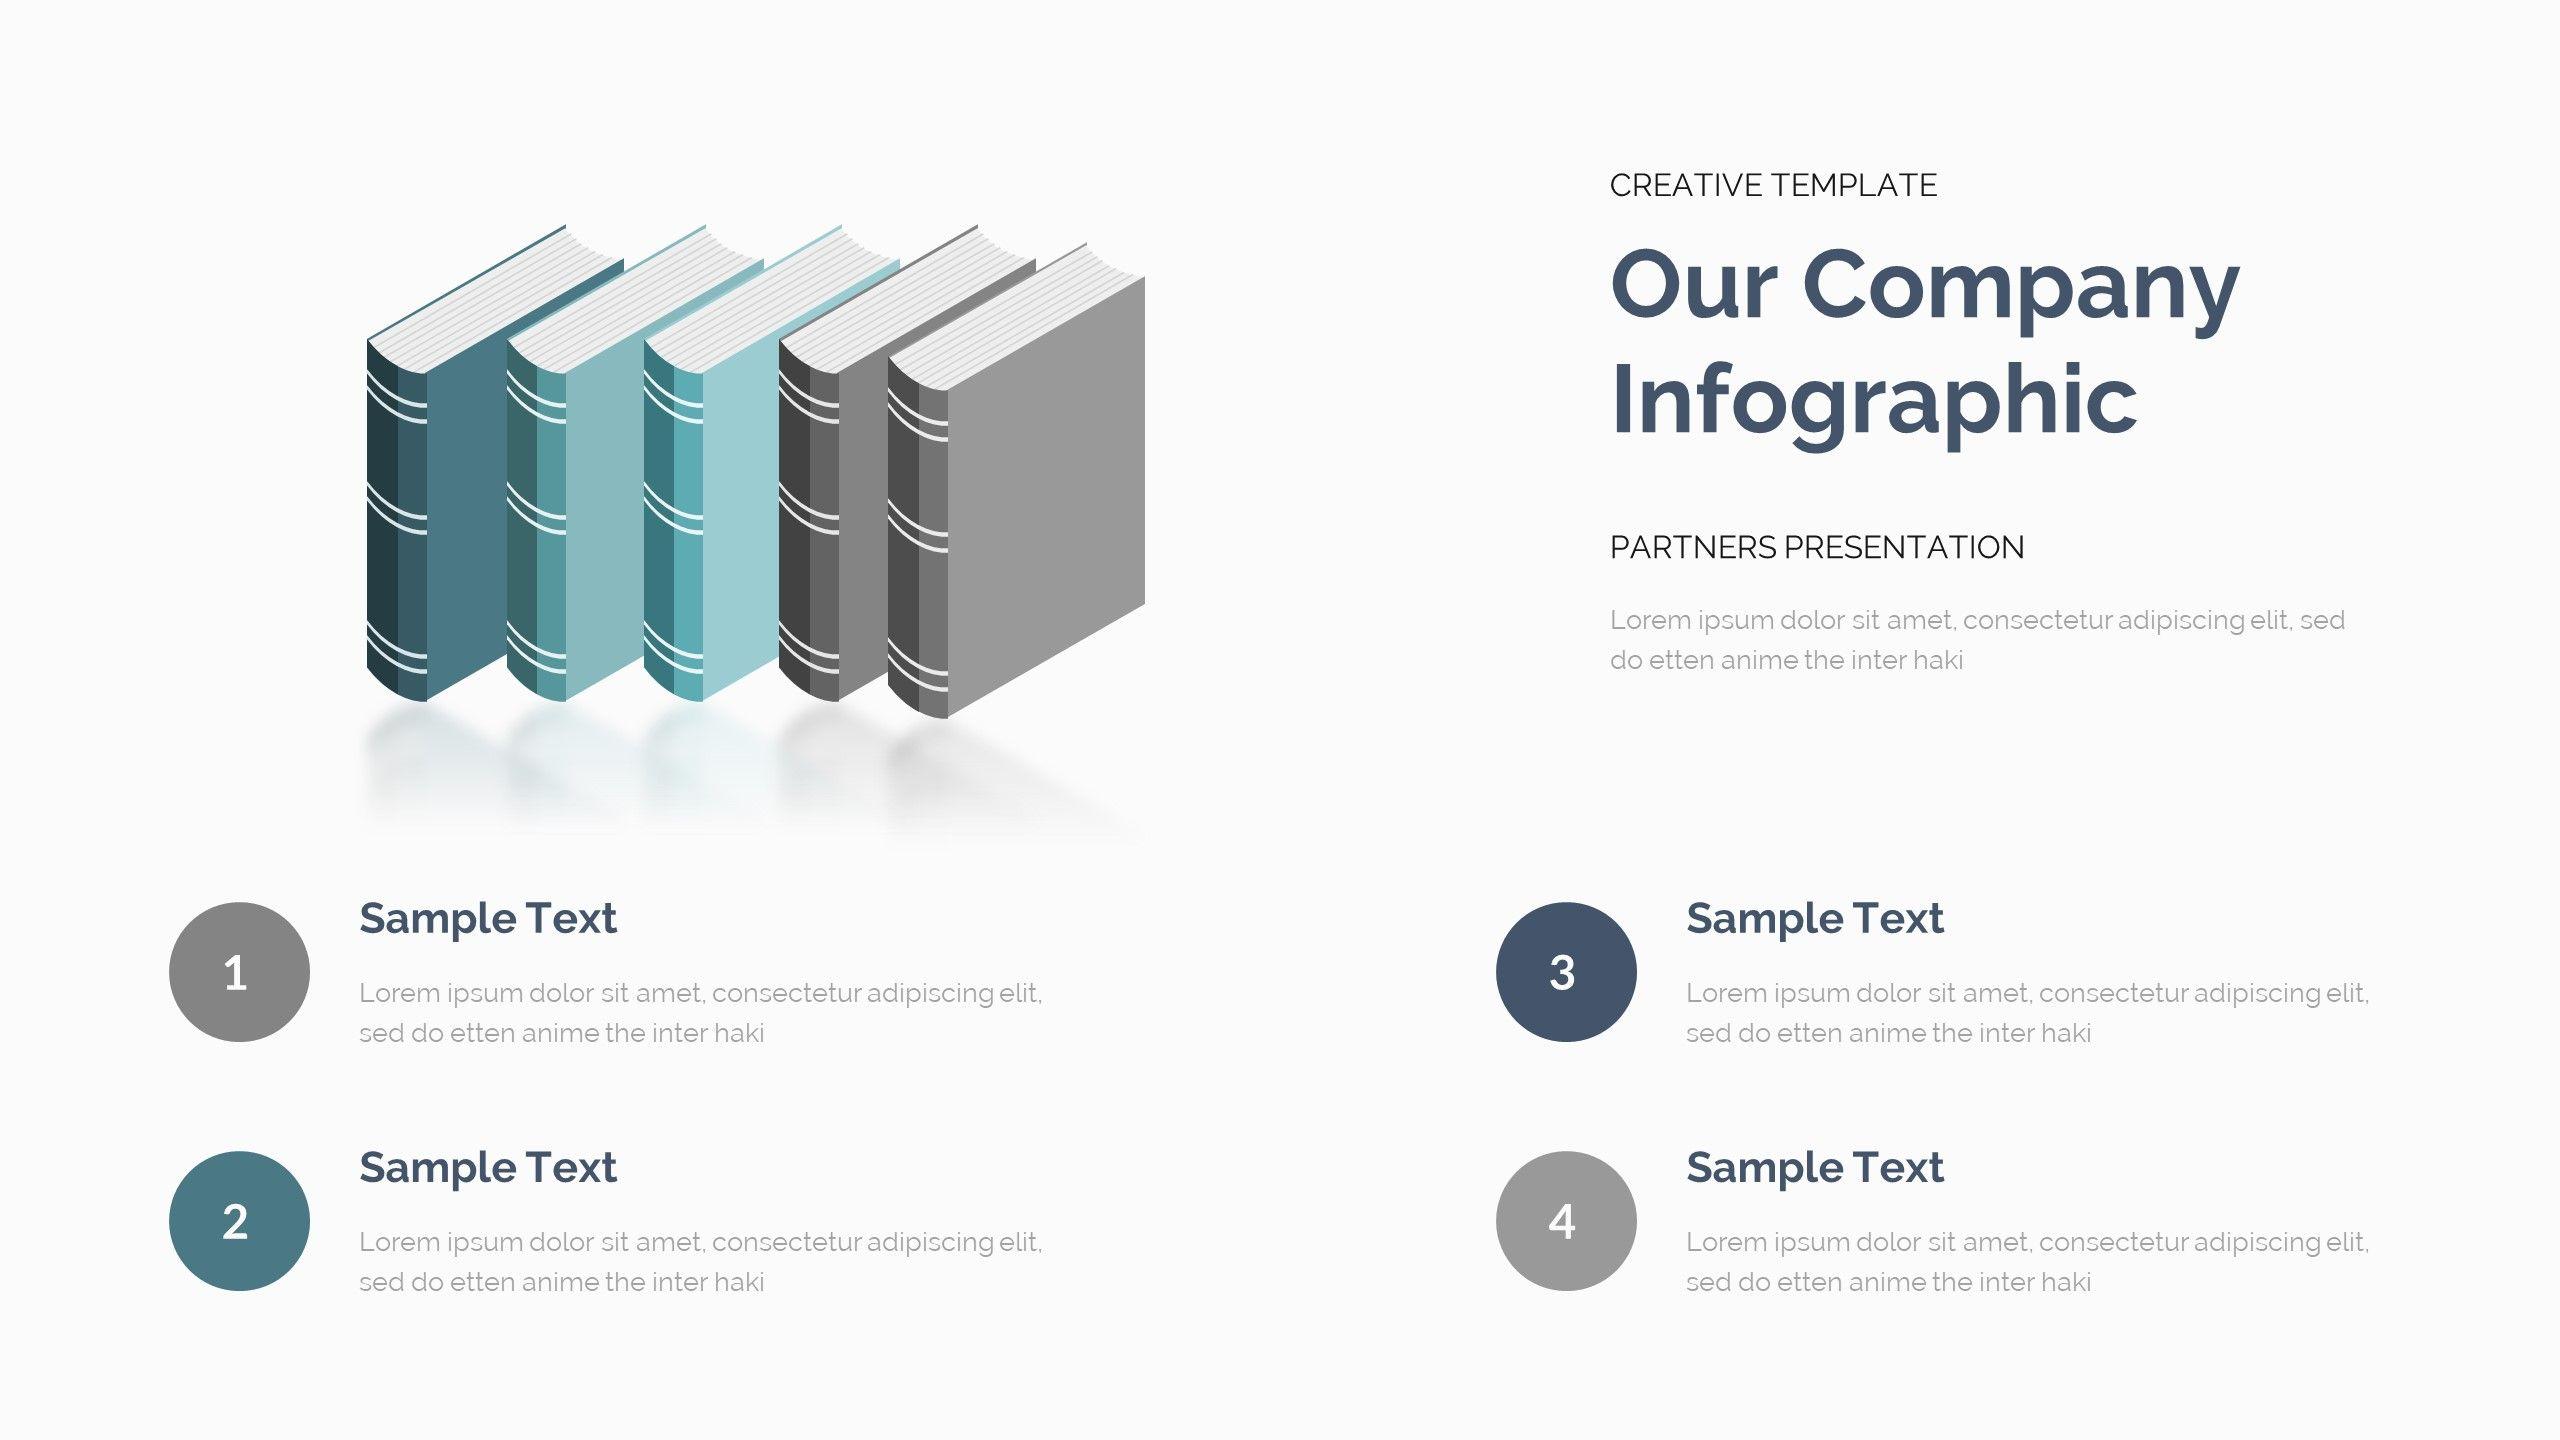 Lunox C Pitch Deck Google Slides Template Ad Sponsored Ad Deck Template Slides Pitch In 2020 Powerpoint Deck Infographic Design Process